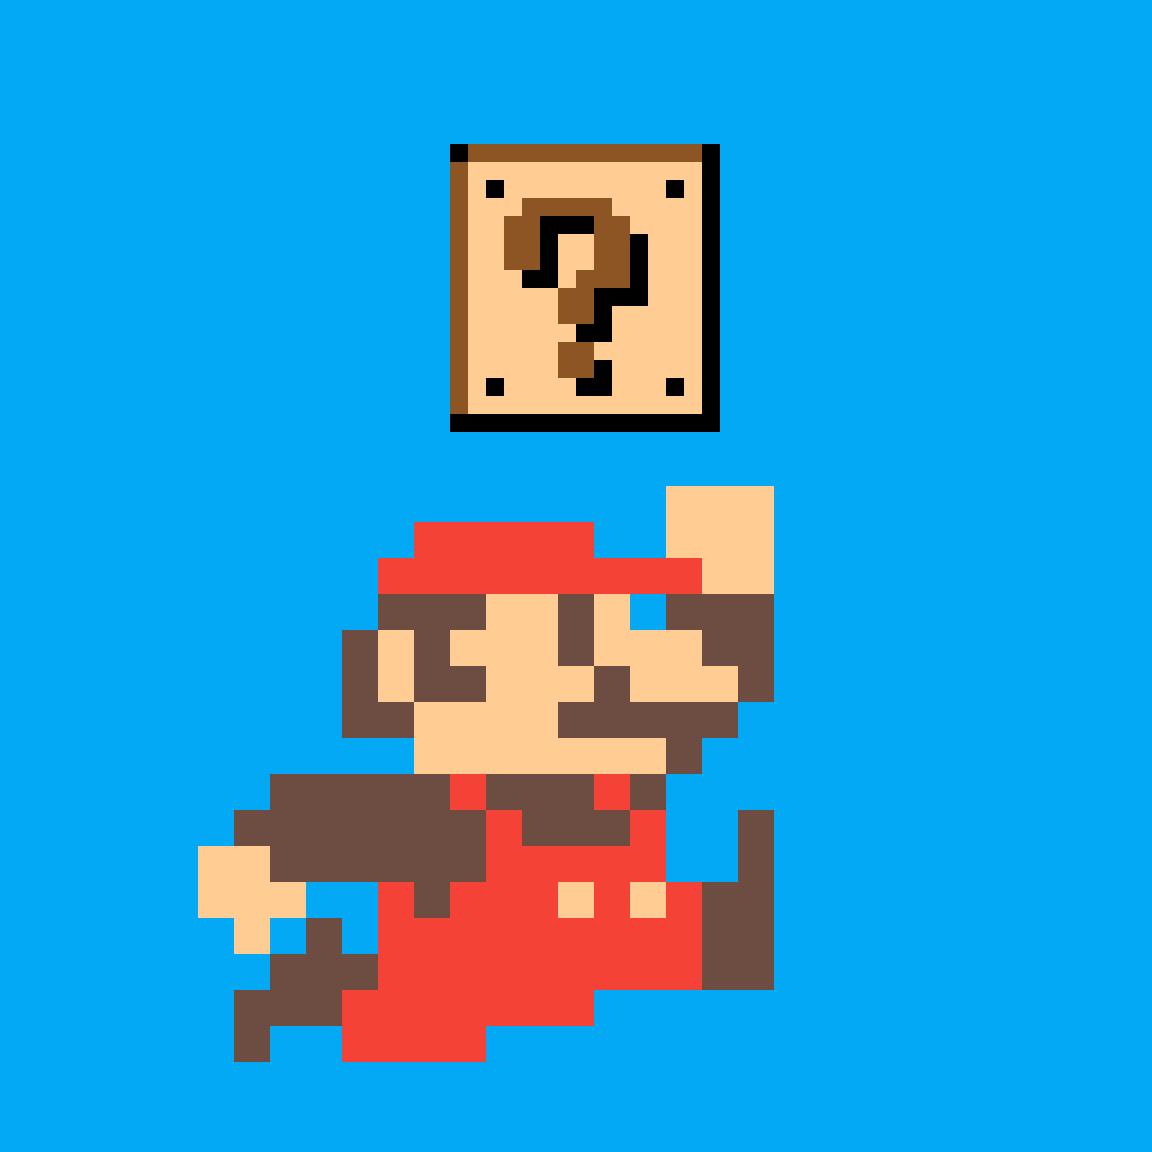 8 bit clipart 64x64 transparent download Pixilart - 8-bit Mario by solimhm transparent download